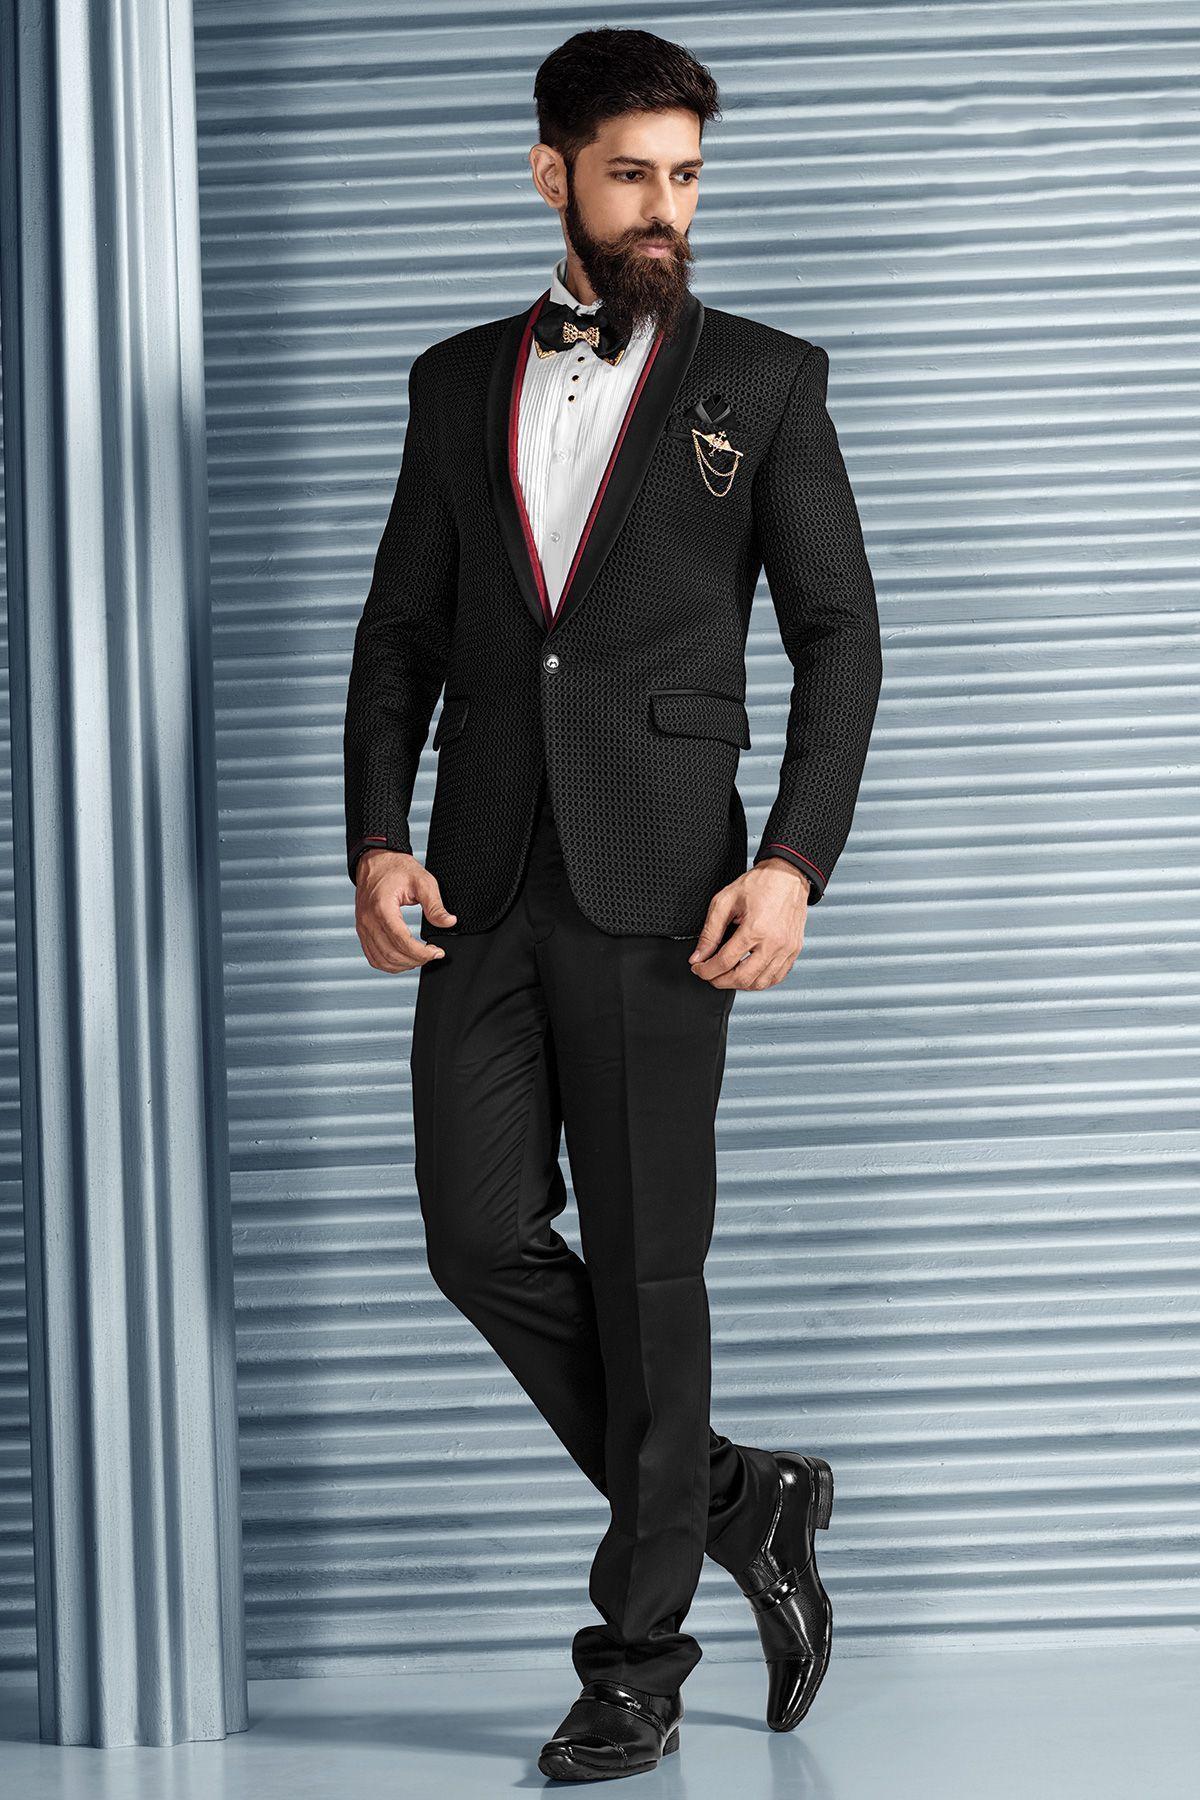 Black Italian Tuxedo Suit-ST617 | TUXEDO SUITS | Pinterest | Buy tuxedo